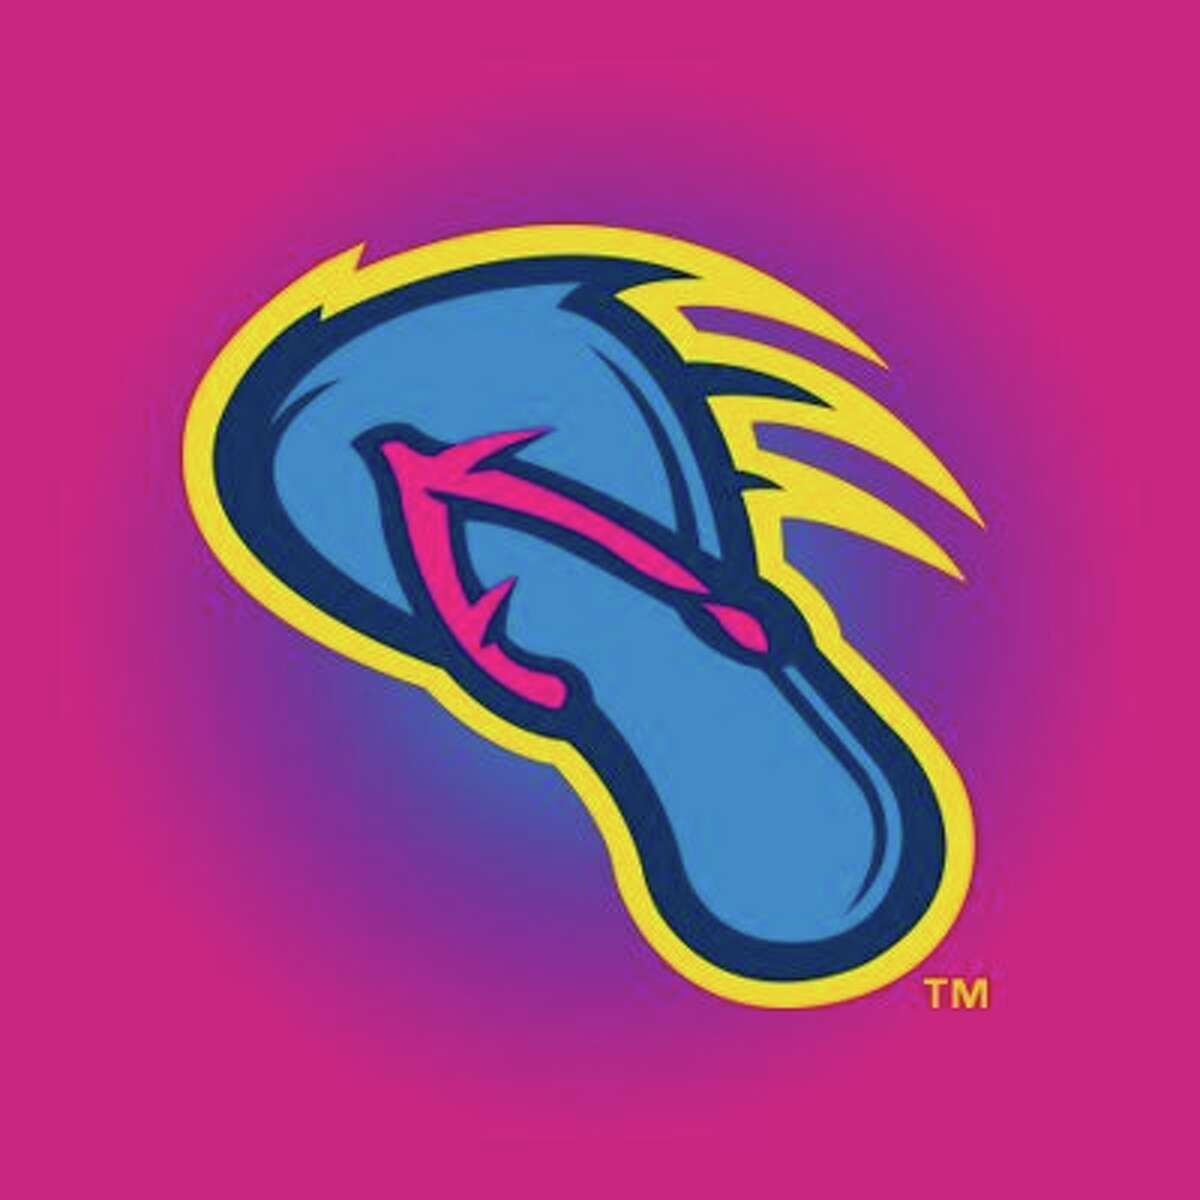 The San Antonio Missions minor league baseball team will become the Flying Chanclas de San Antonio for nine games during the 2018 season, Minor League baseball announced